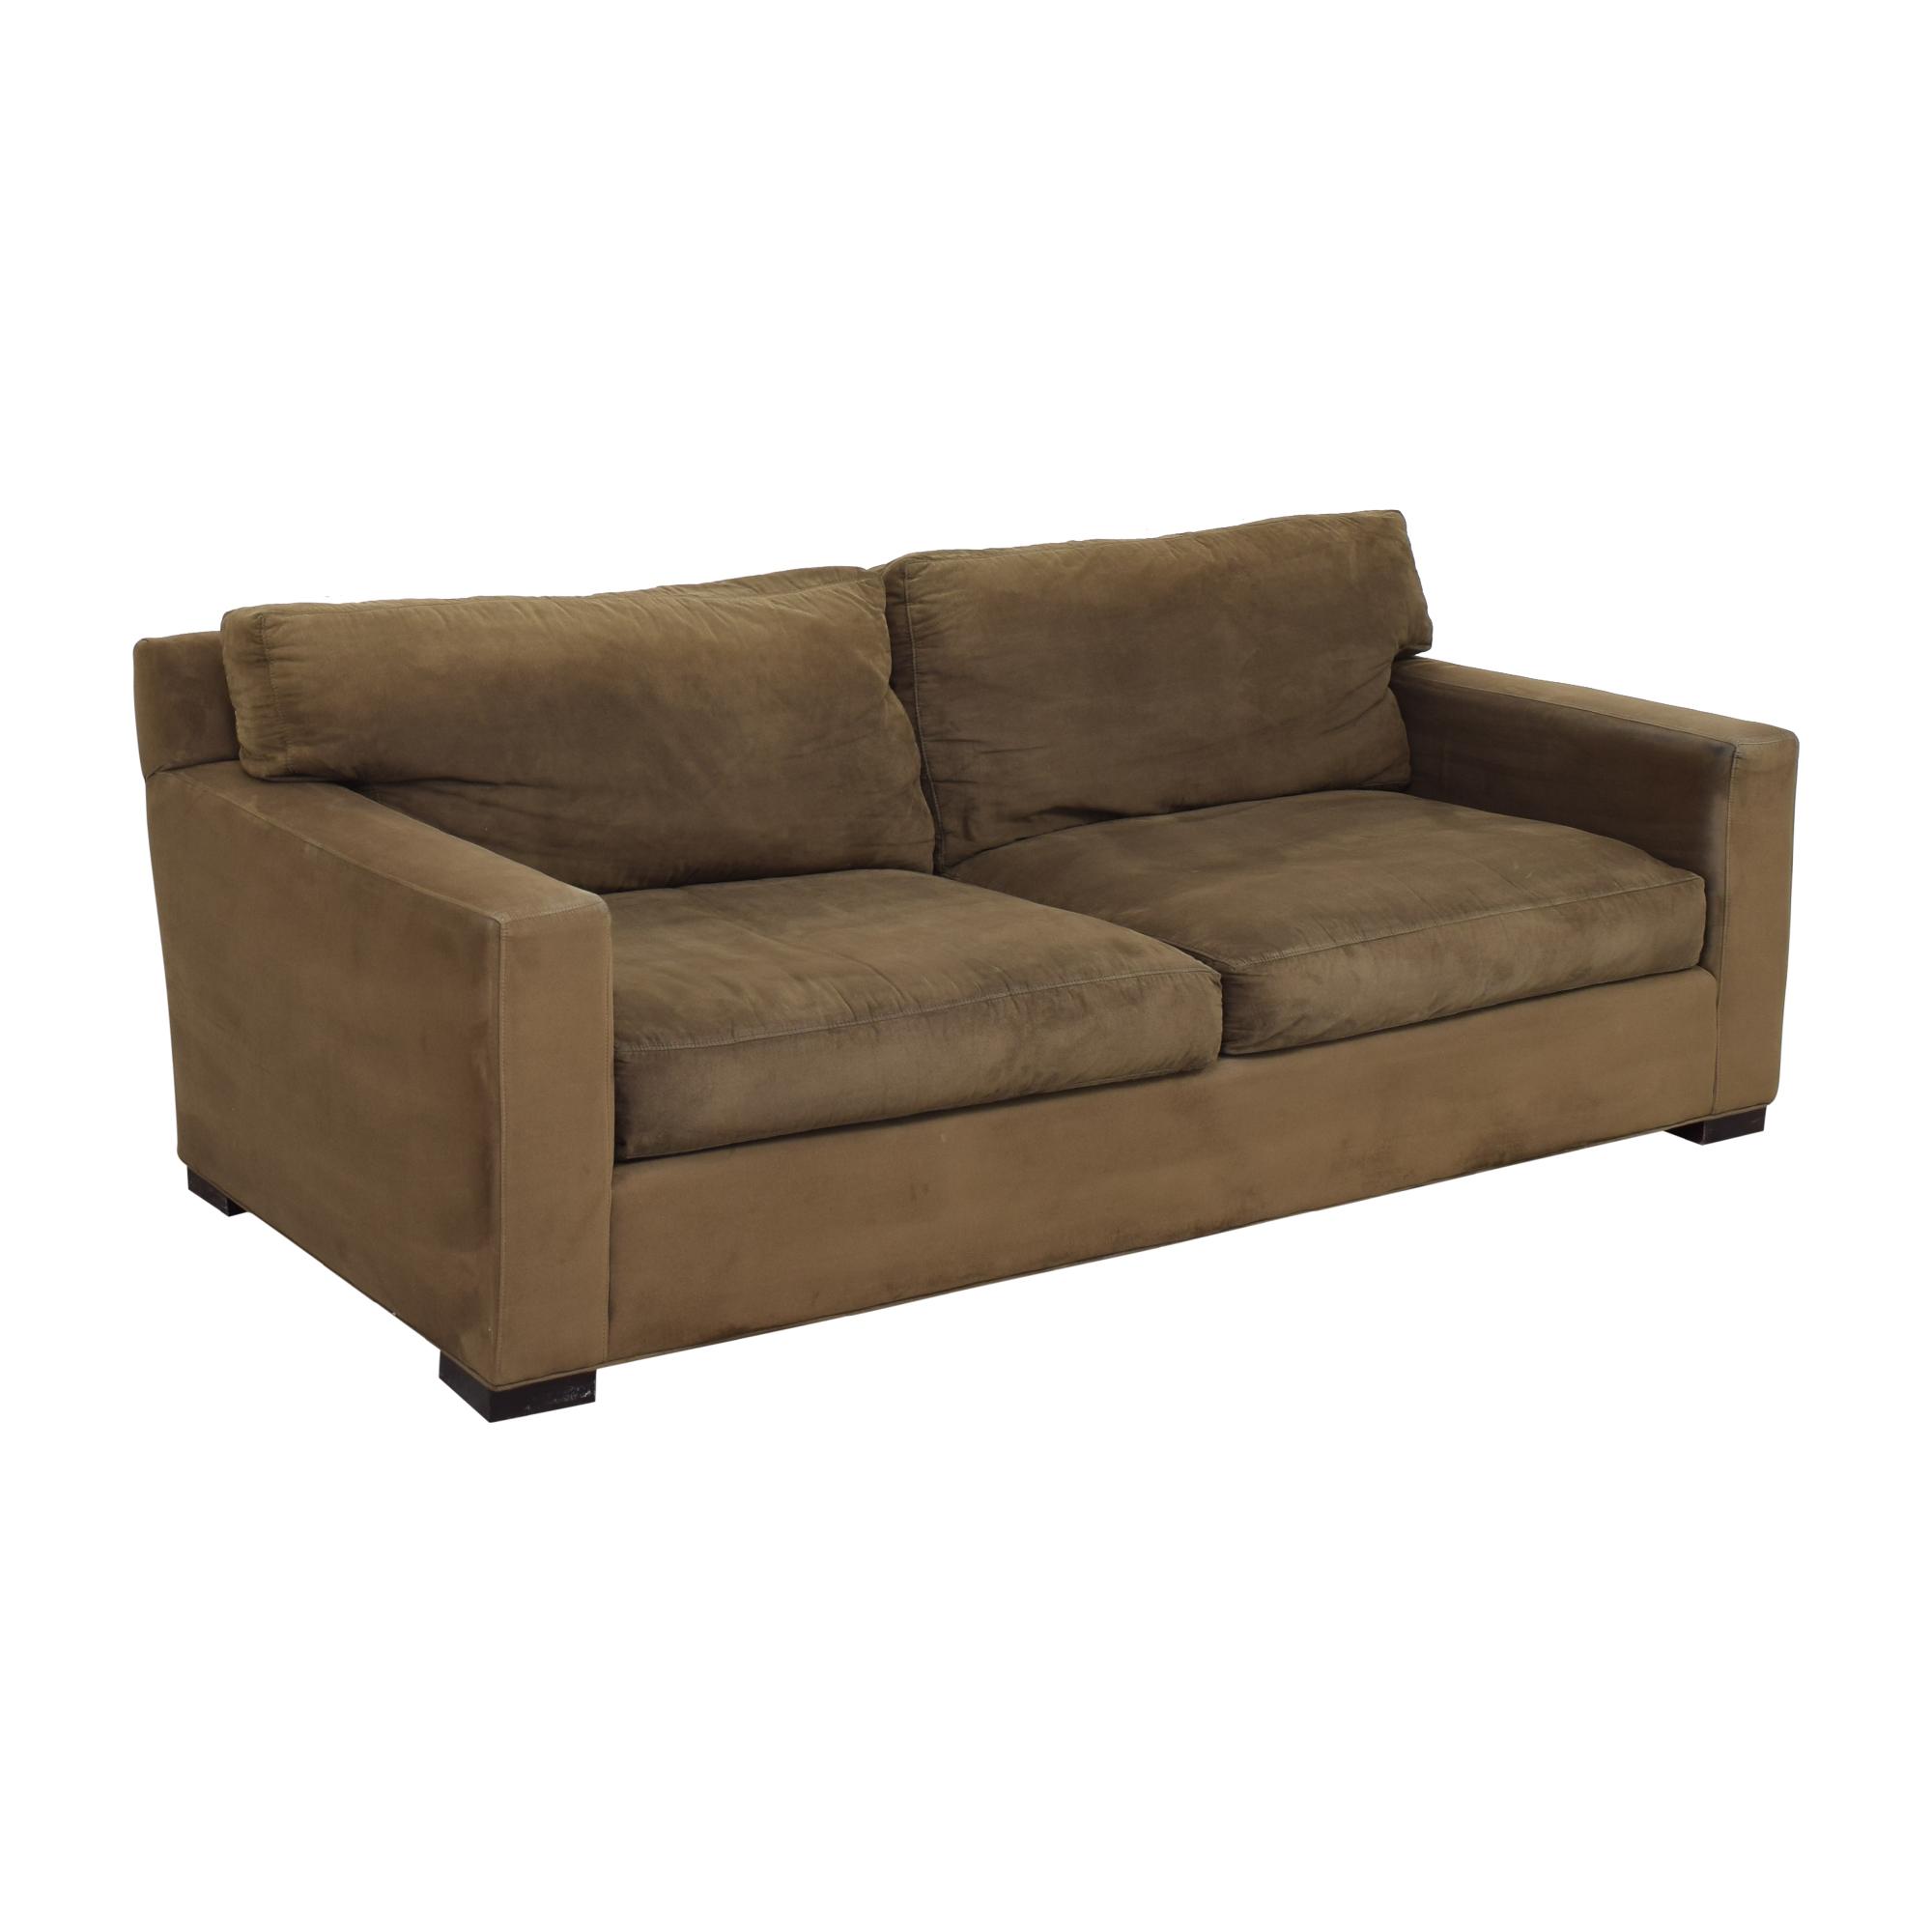 Crate & Barrel Crate & Barrel Axis II Two Cushion Sofa discount